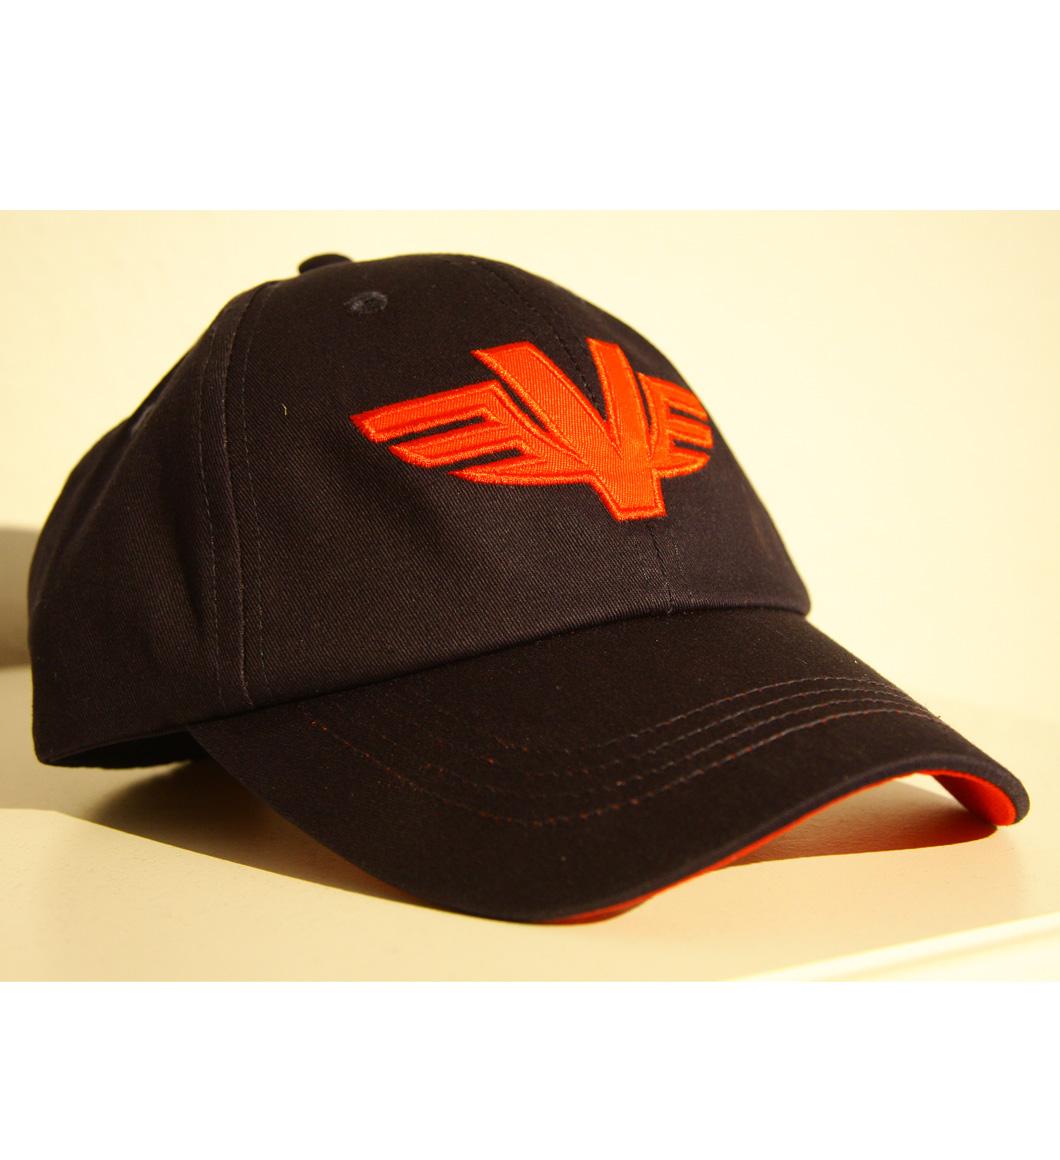 Veedol Basecap – Cruising Edition